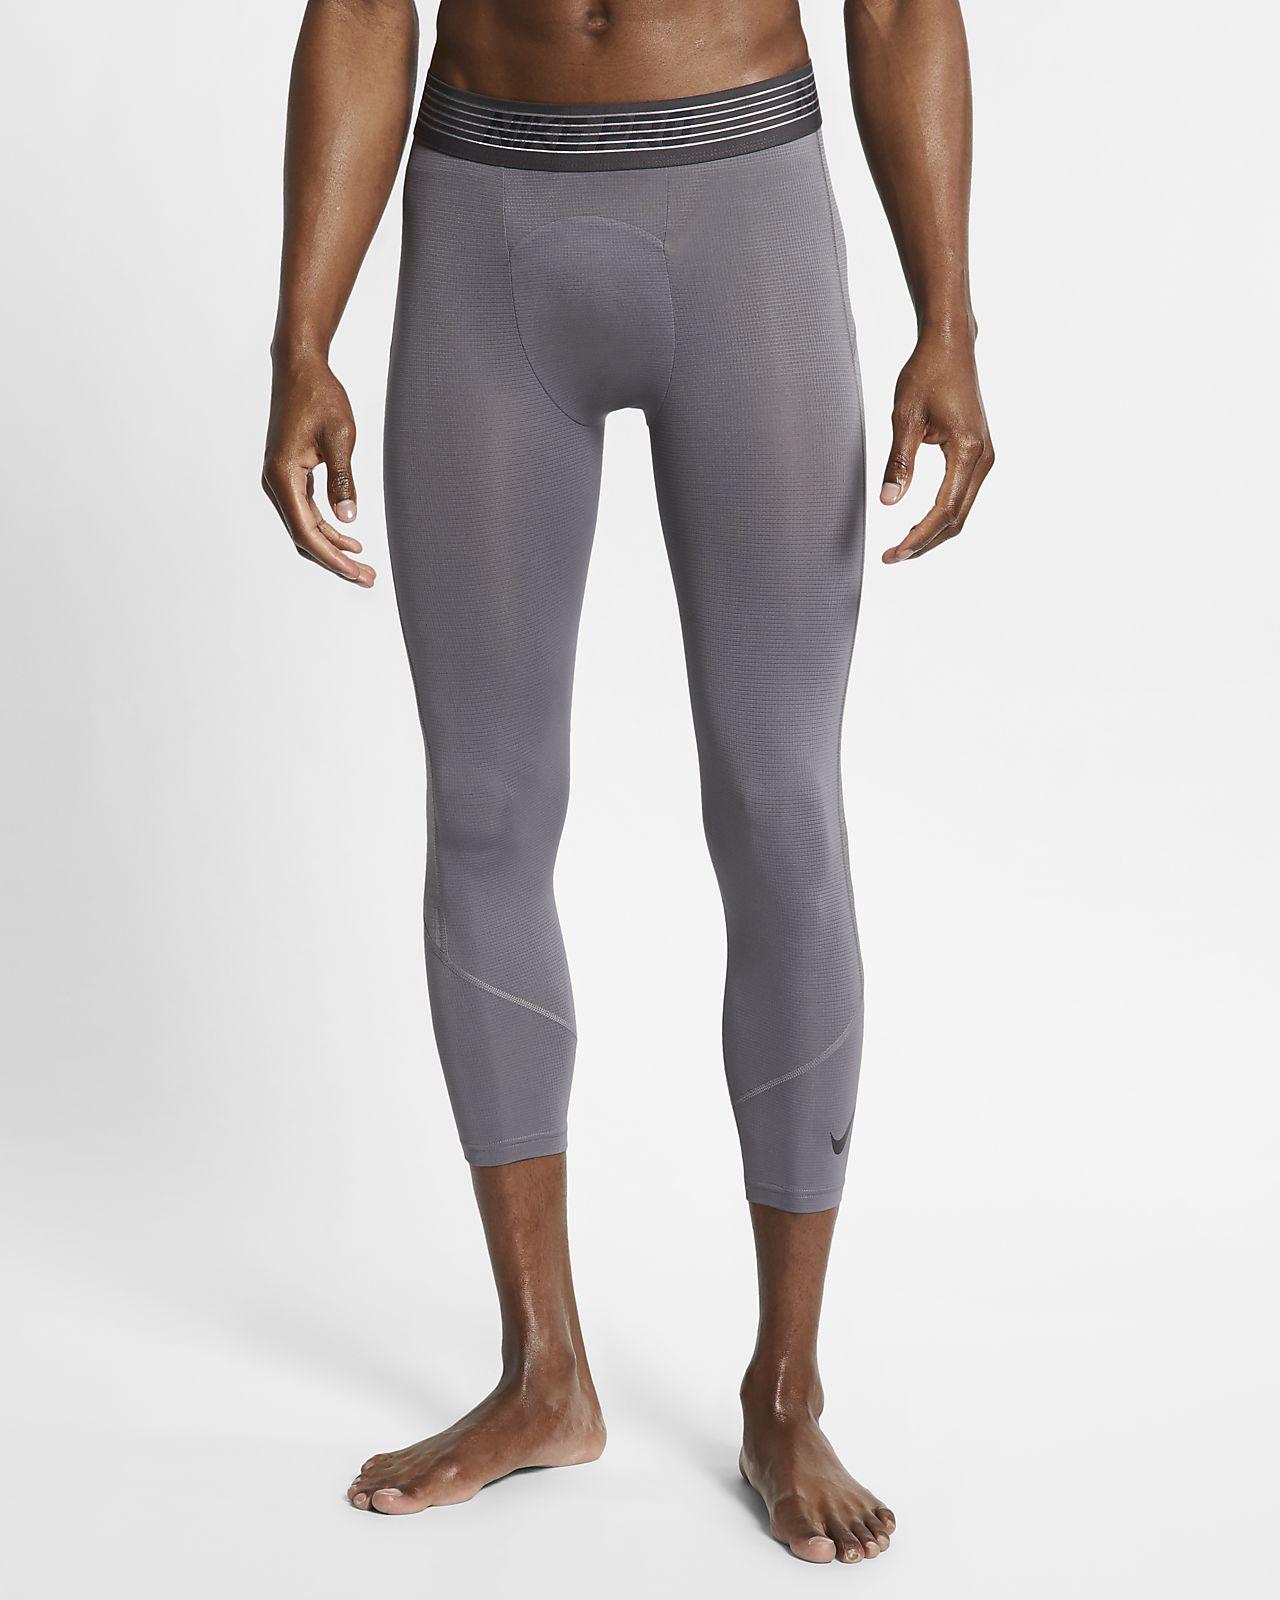 Nike Pro3/4 男子训练紧身裤